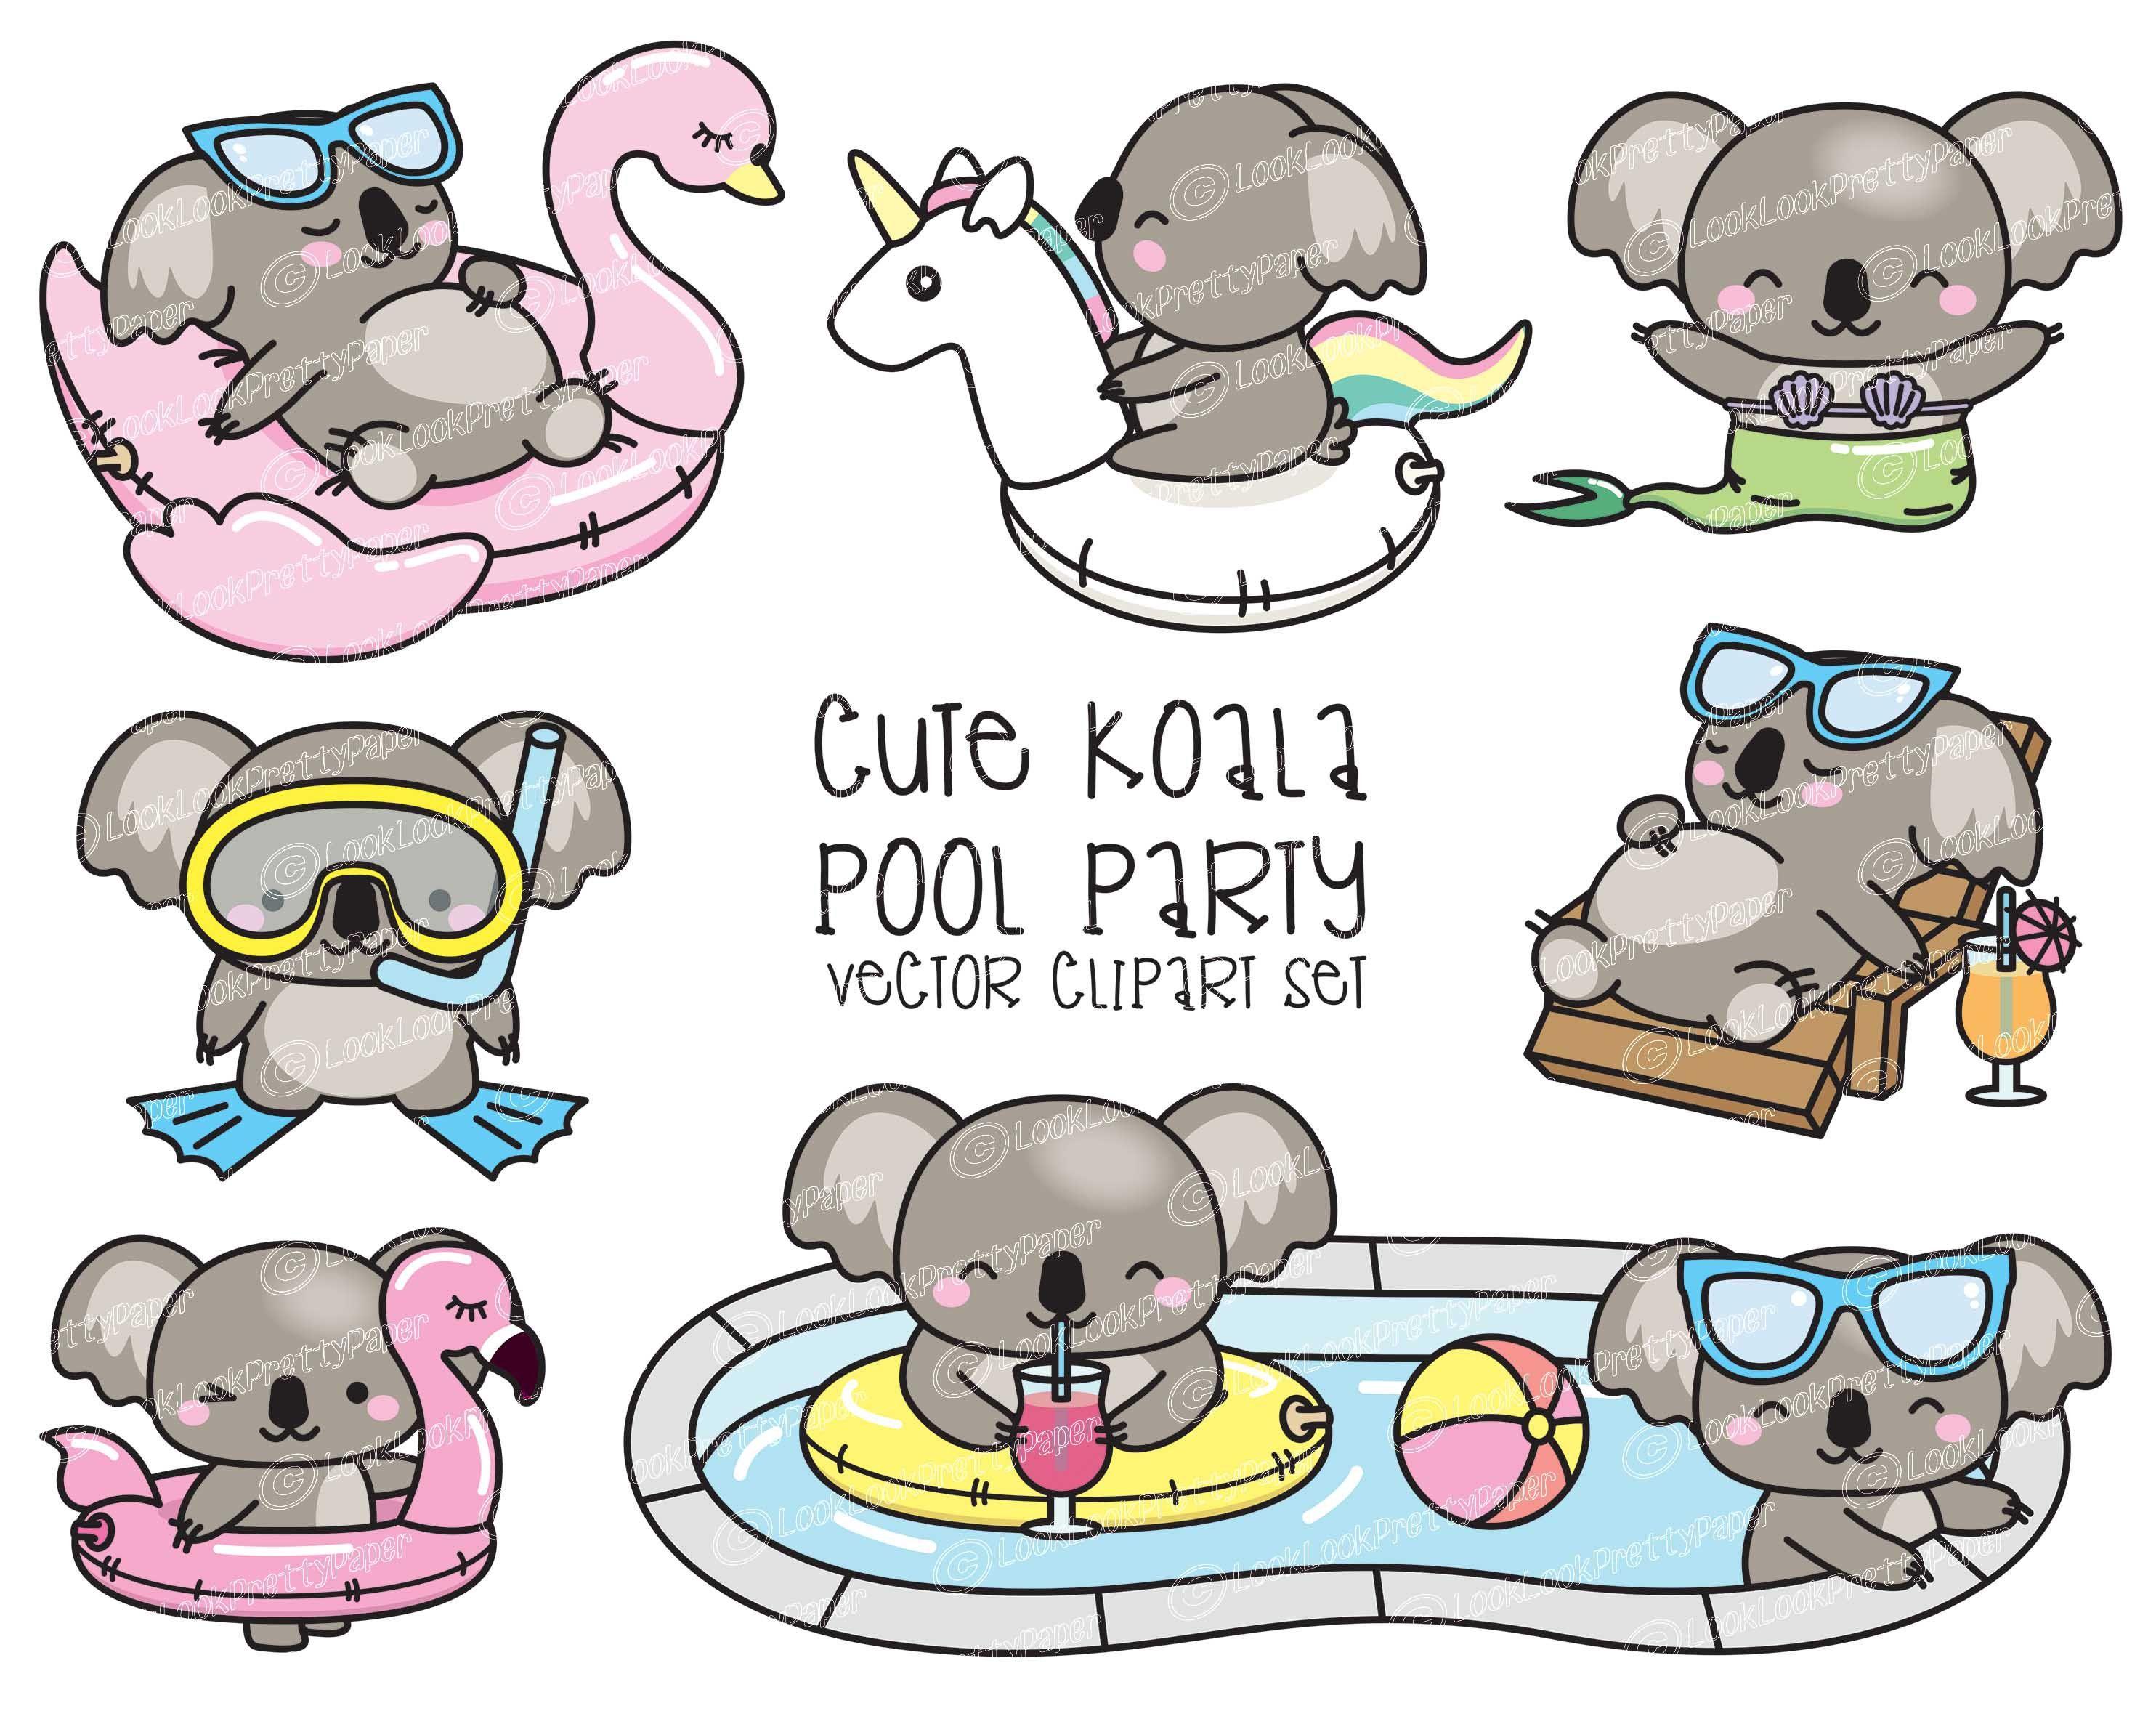 Premium Vector Clipart Kawaii Koala Cute Koala Pool Party Clipart Pool Party Instant Download Kawaii Clipart Kawaii Clipart Koalas Koala